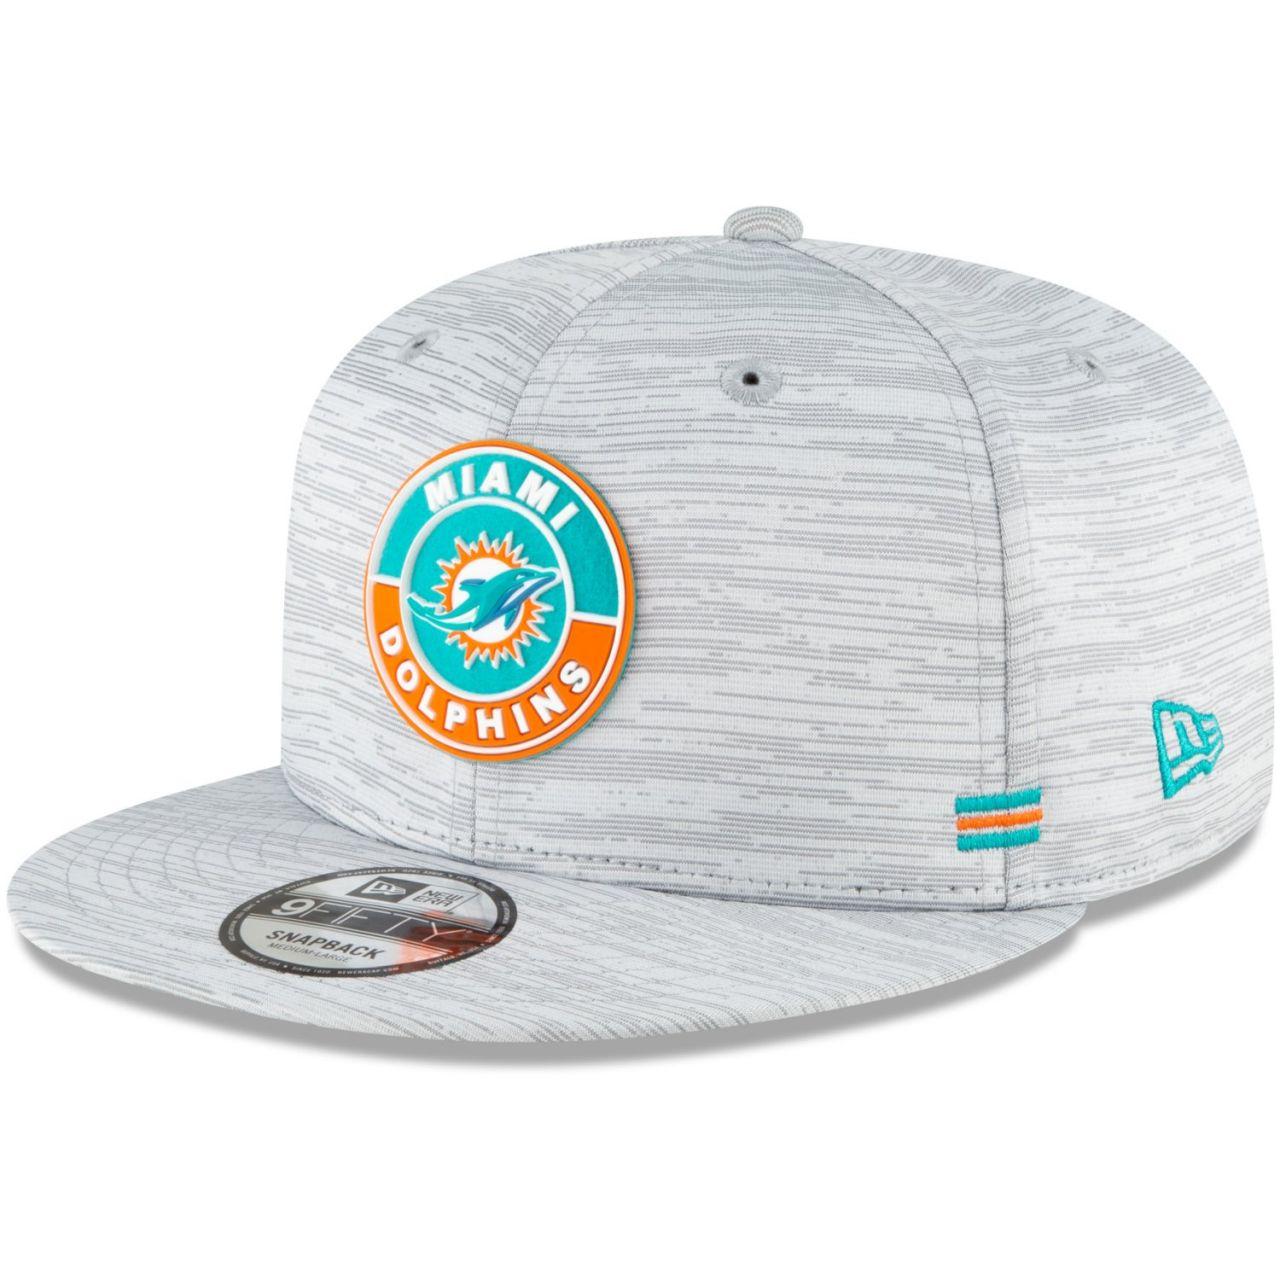 amfoo - New Era 9FIFTY Snapback Cap - SIDELINE 2020 Miami Dolphins